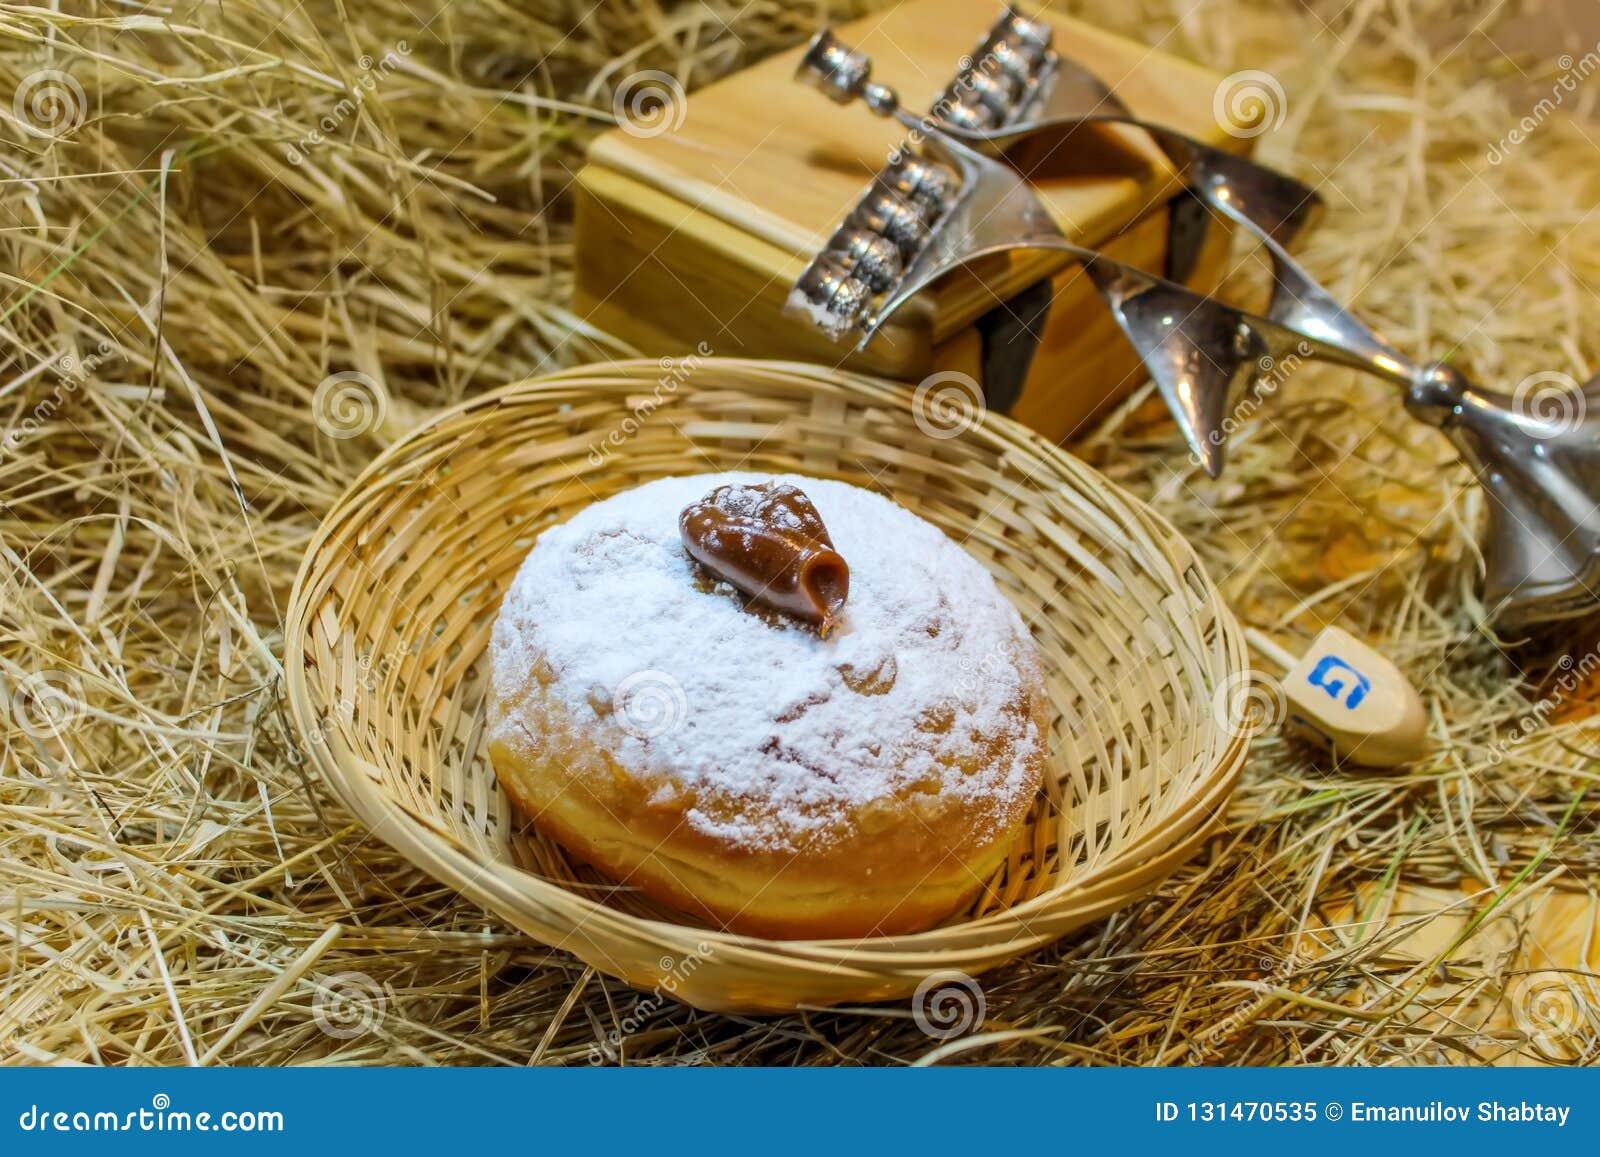 Hanukkah Sufganiyah for Jewish Holiday